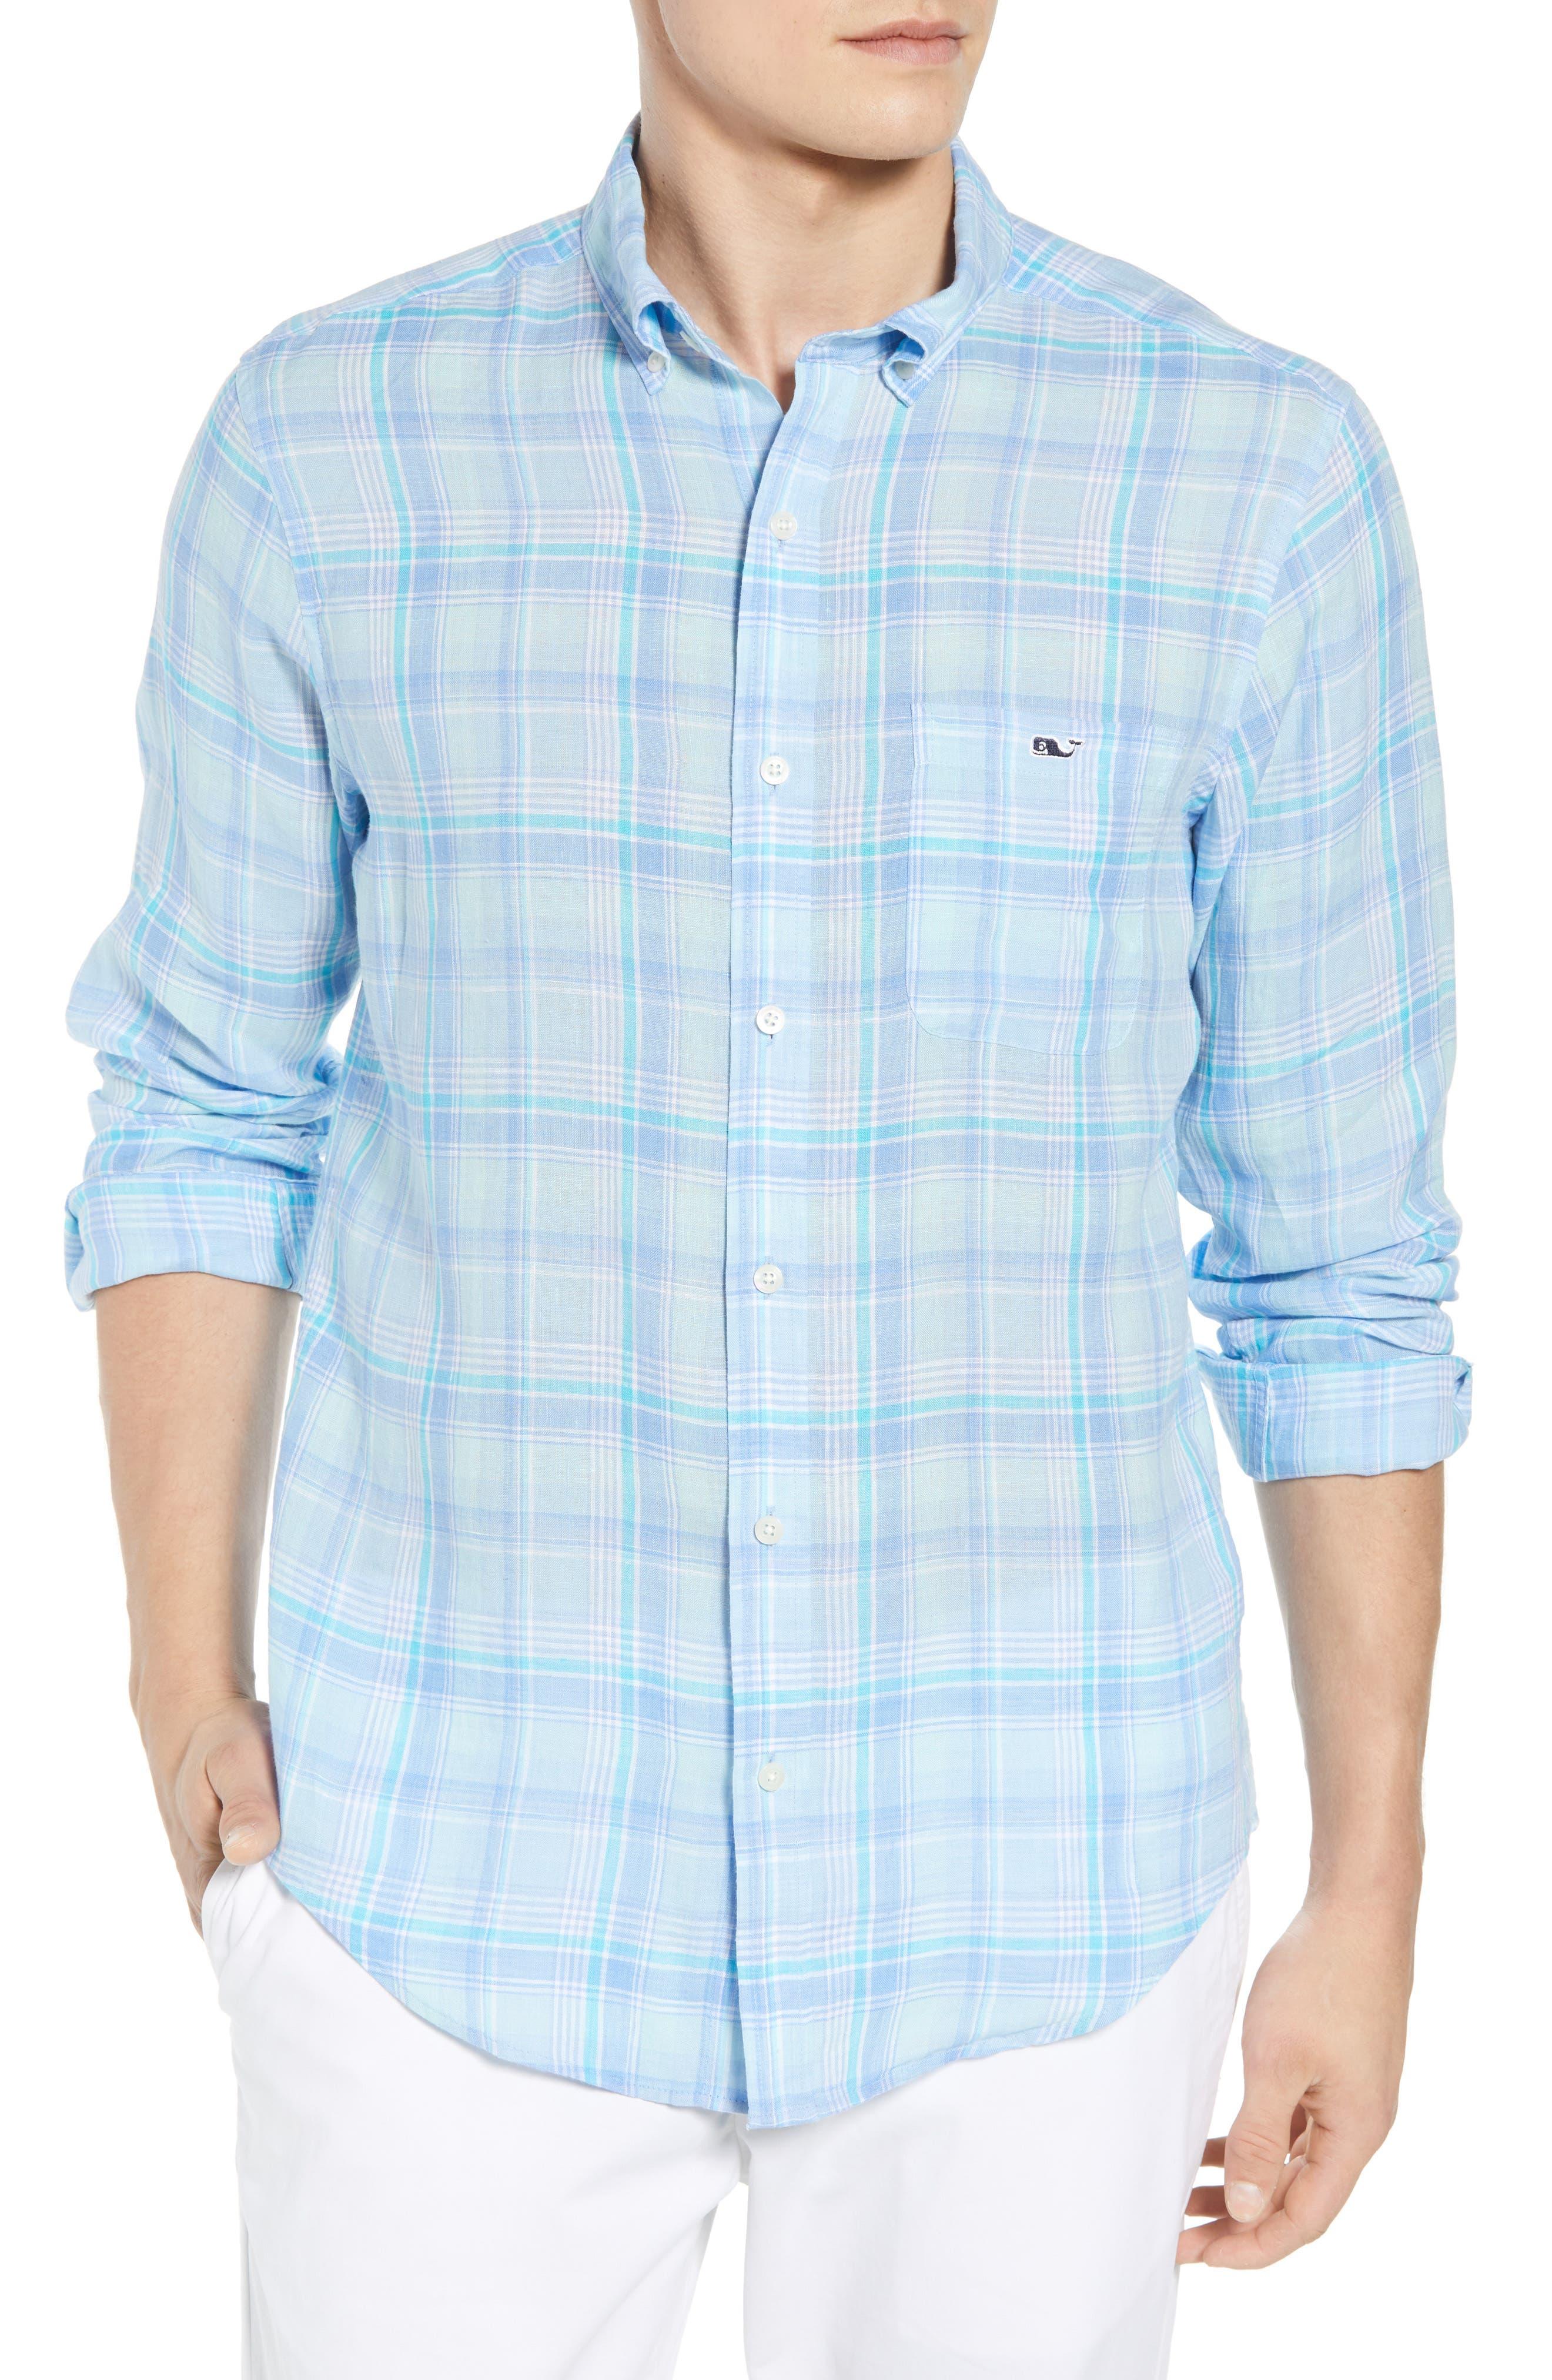 Moore's Island Classic Fit Plaid Sport Shirt,                             Main thumbnail 1, color,                             Baja Blue